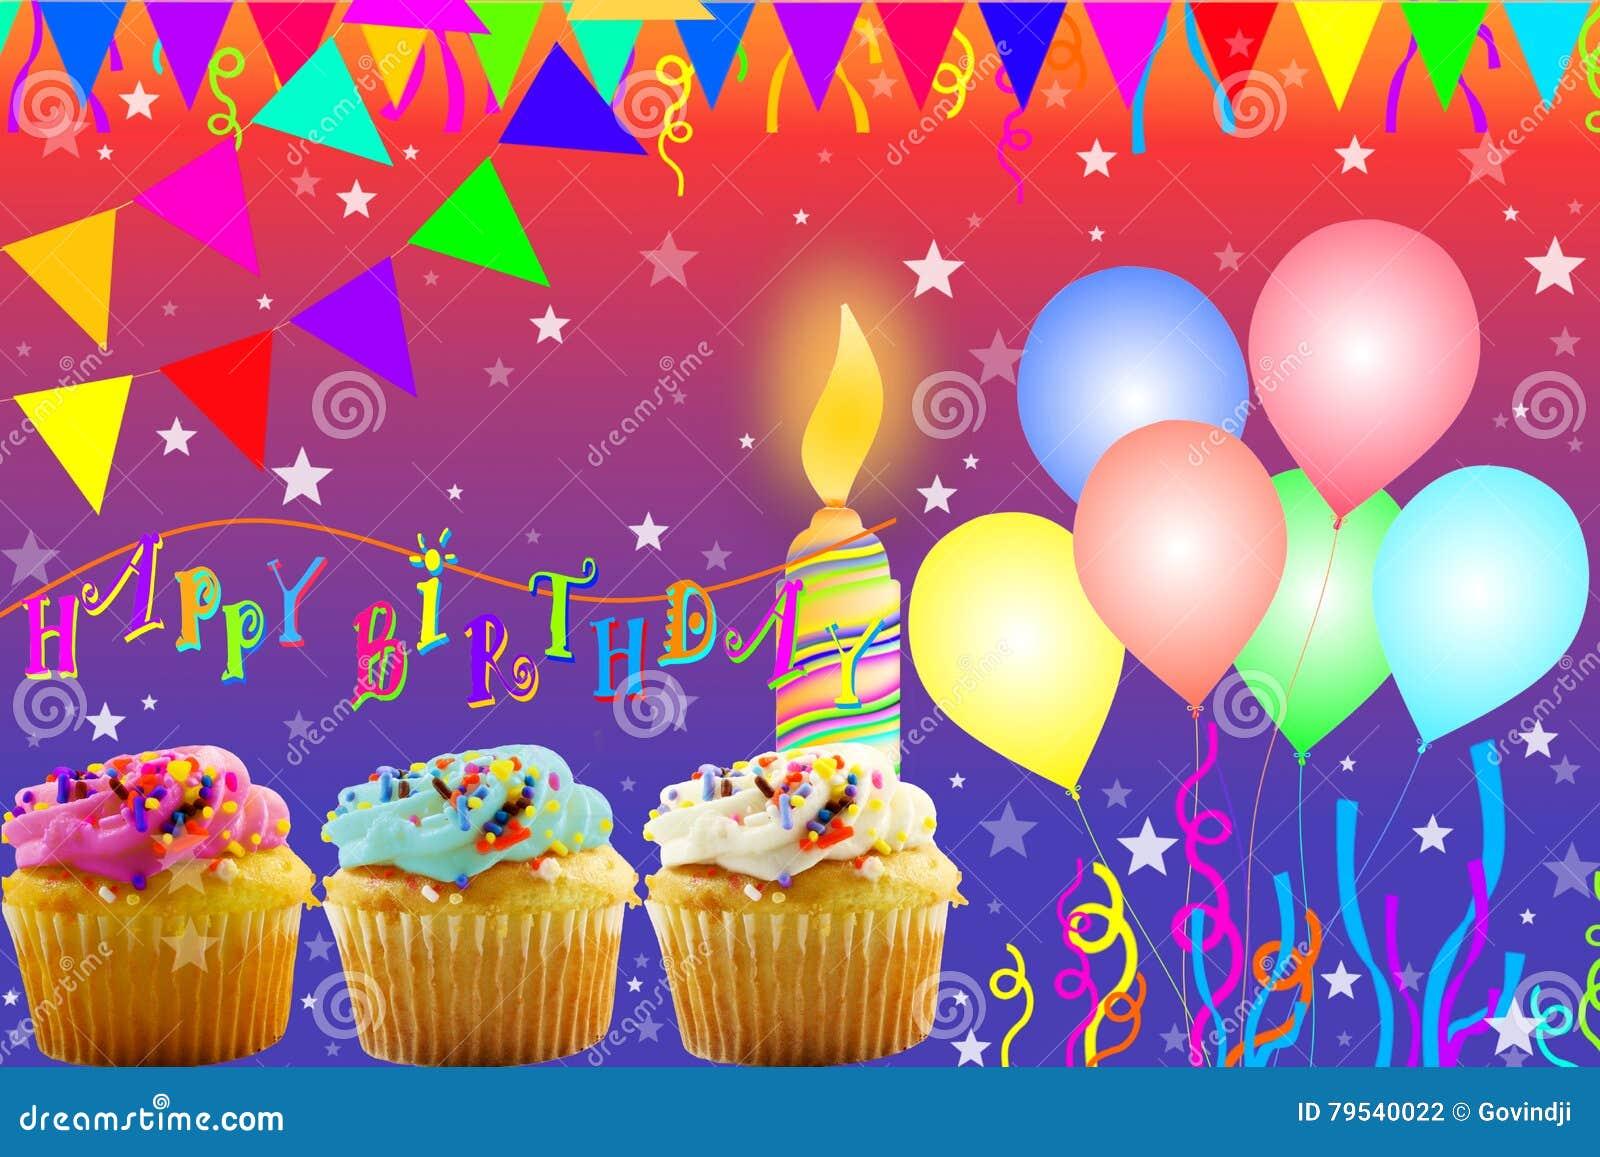 Birthday greeting card stock illustration illustration of download birthday greeting card stock illustration illustration of decoration 79540022 m4hsunfo